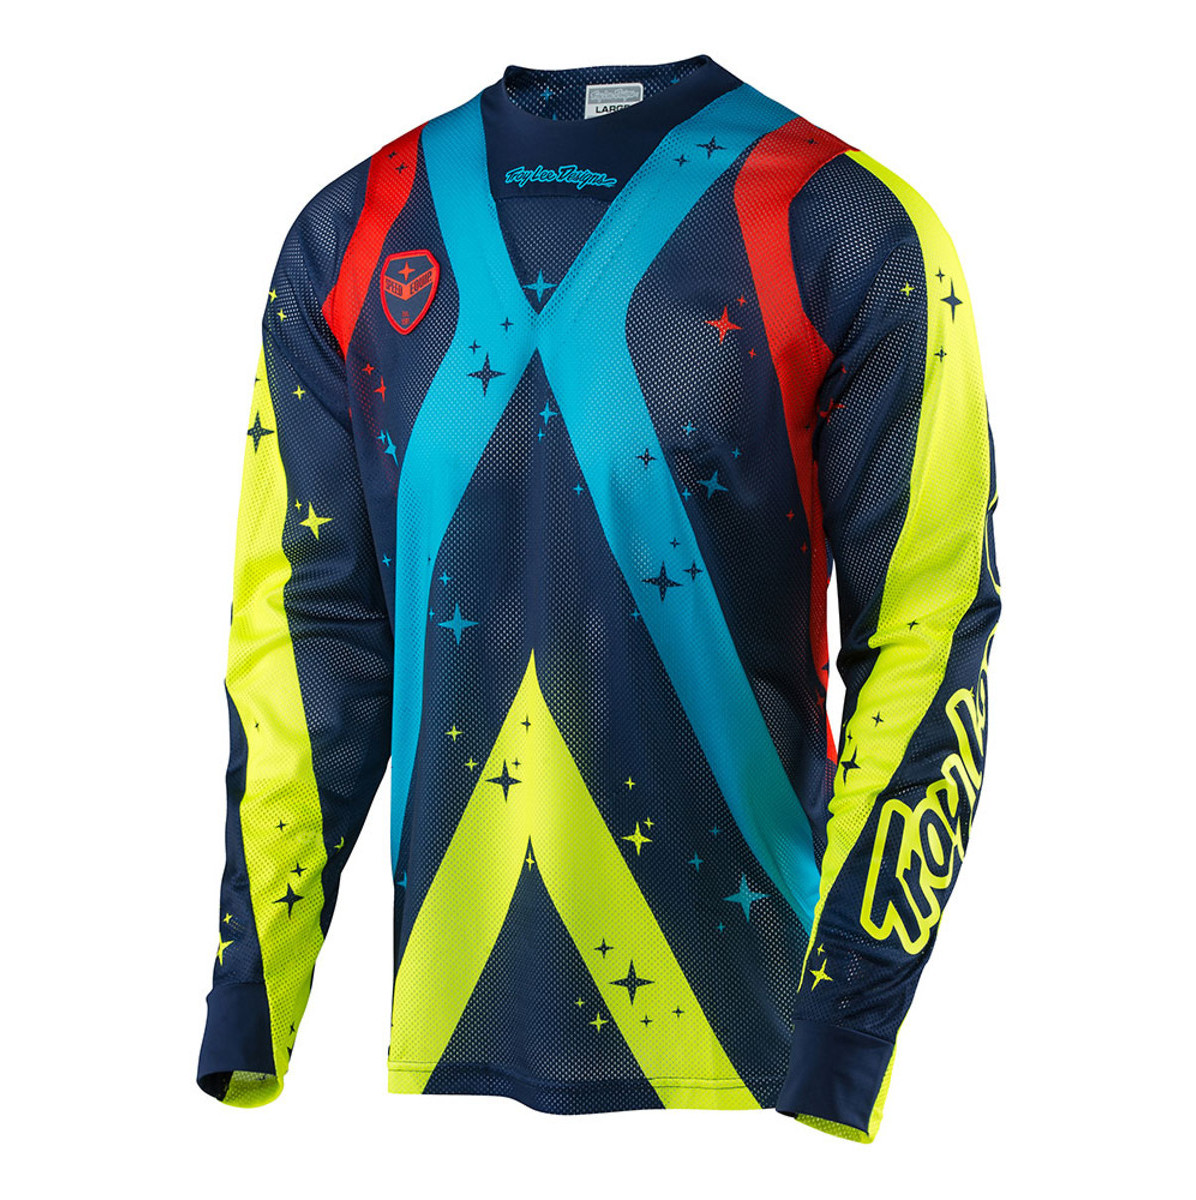 Troy Lee Designs SE Air Phantom Jersey & Pant  Troy Lee Designs SE Air Phantom Jersey & Pant Blue